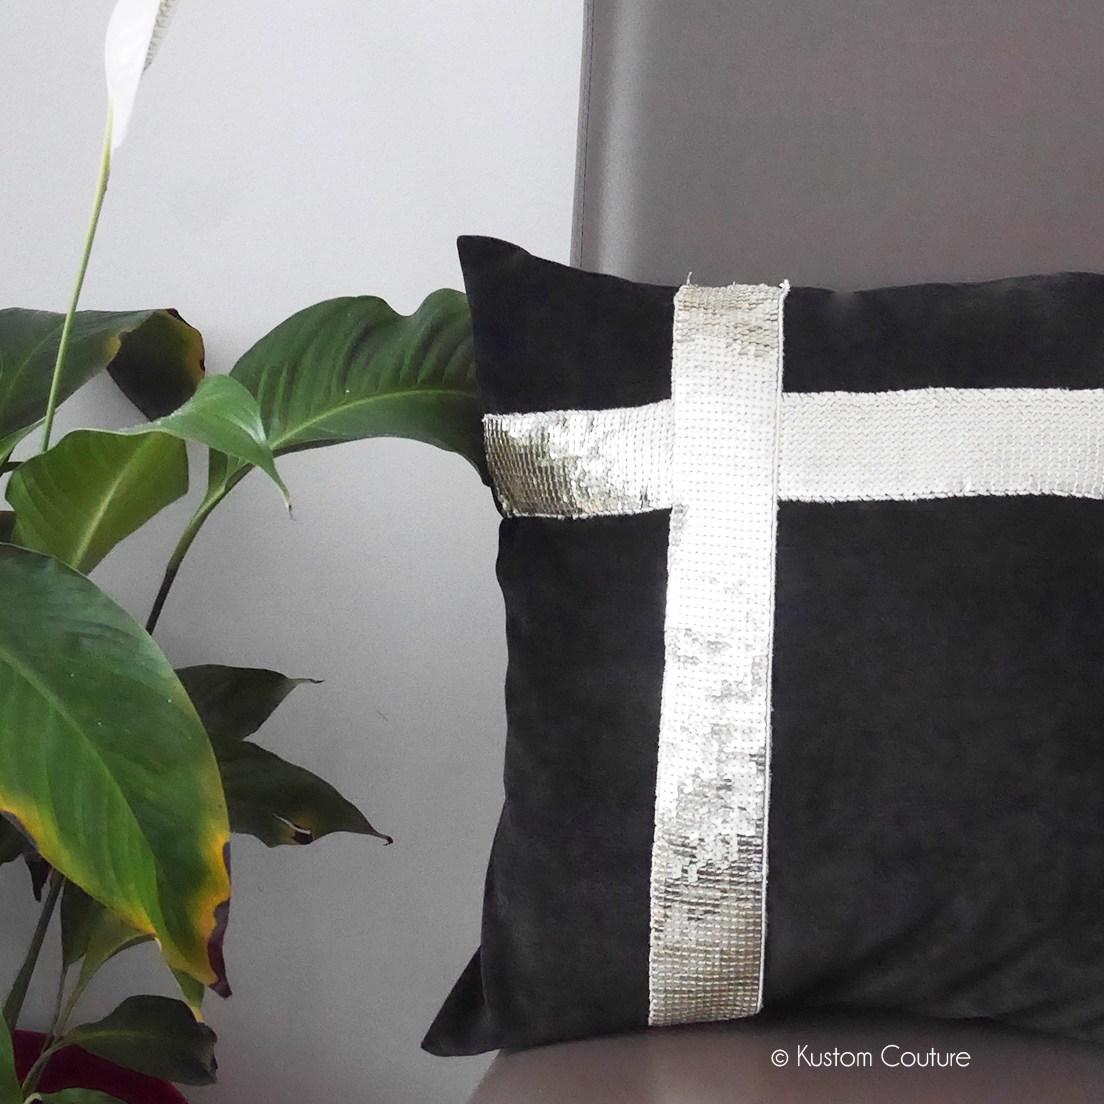 Customiser des coussins avec du ruban | Kustom Couture